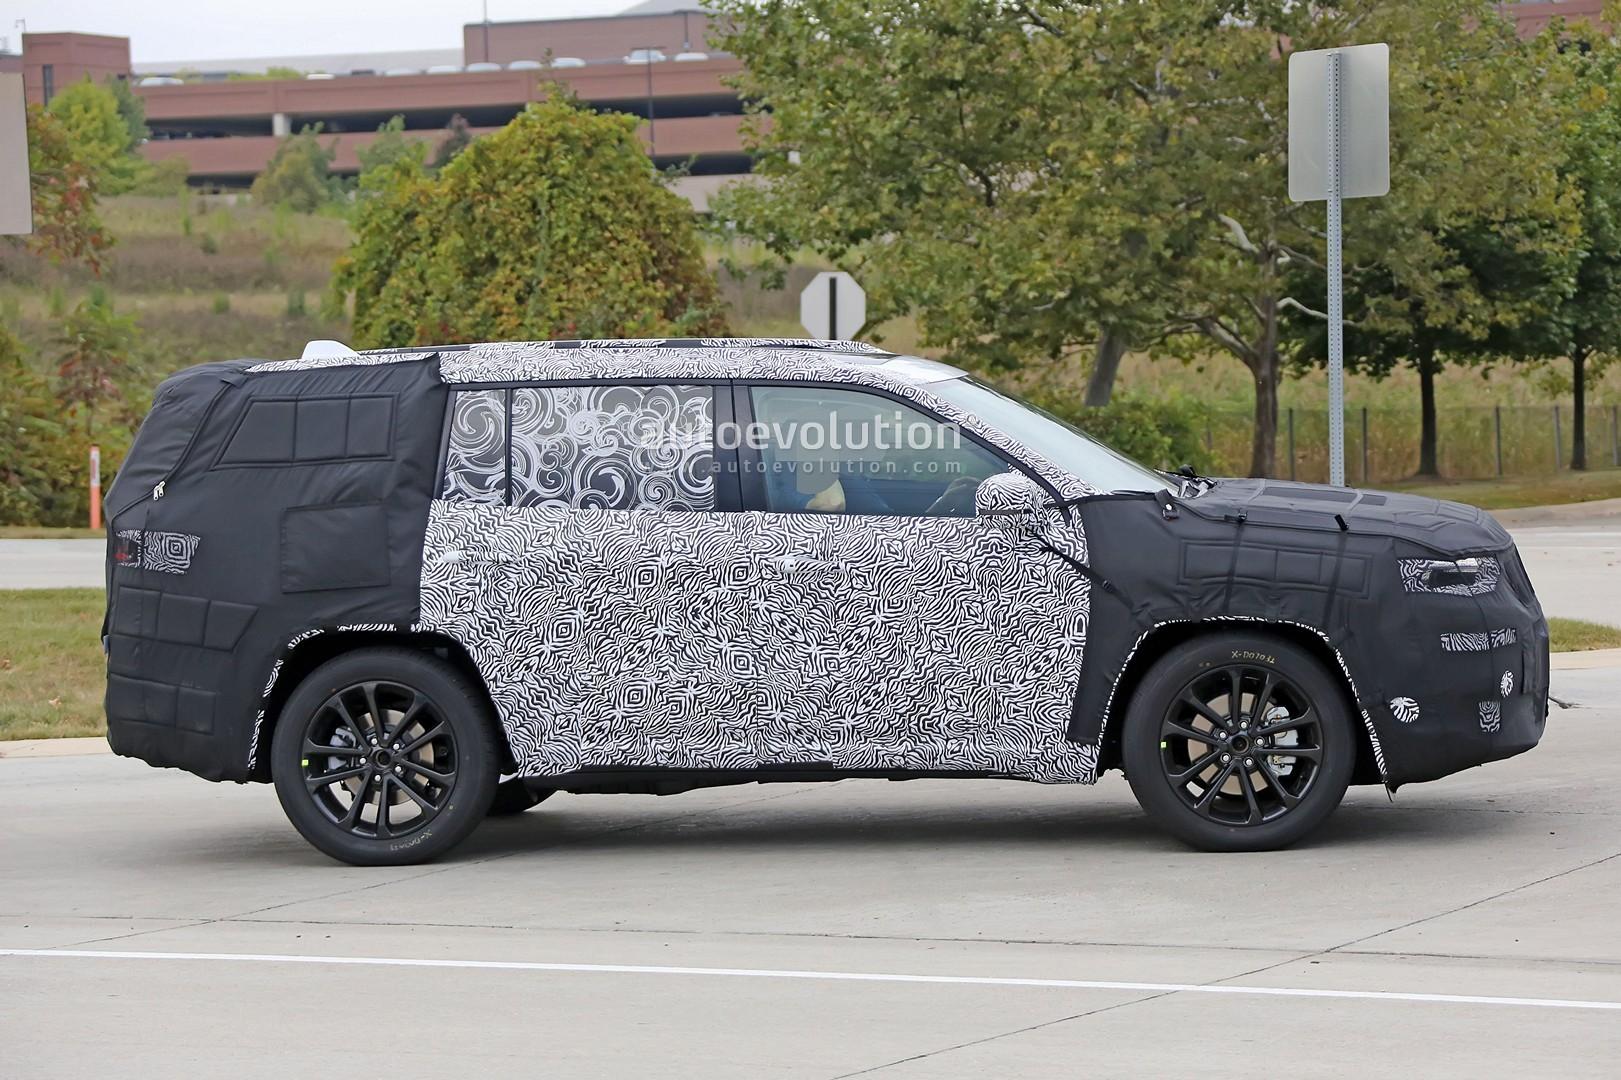 3 Row Jeep >> Spyshots Production Jeep Yuntu 3 Row Crossover Road Testing Begins